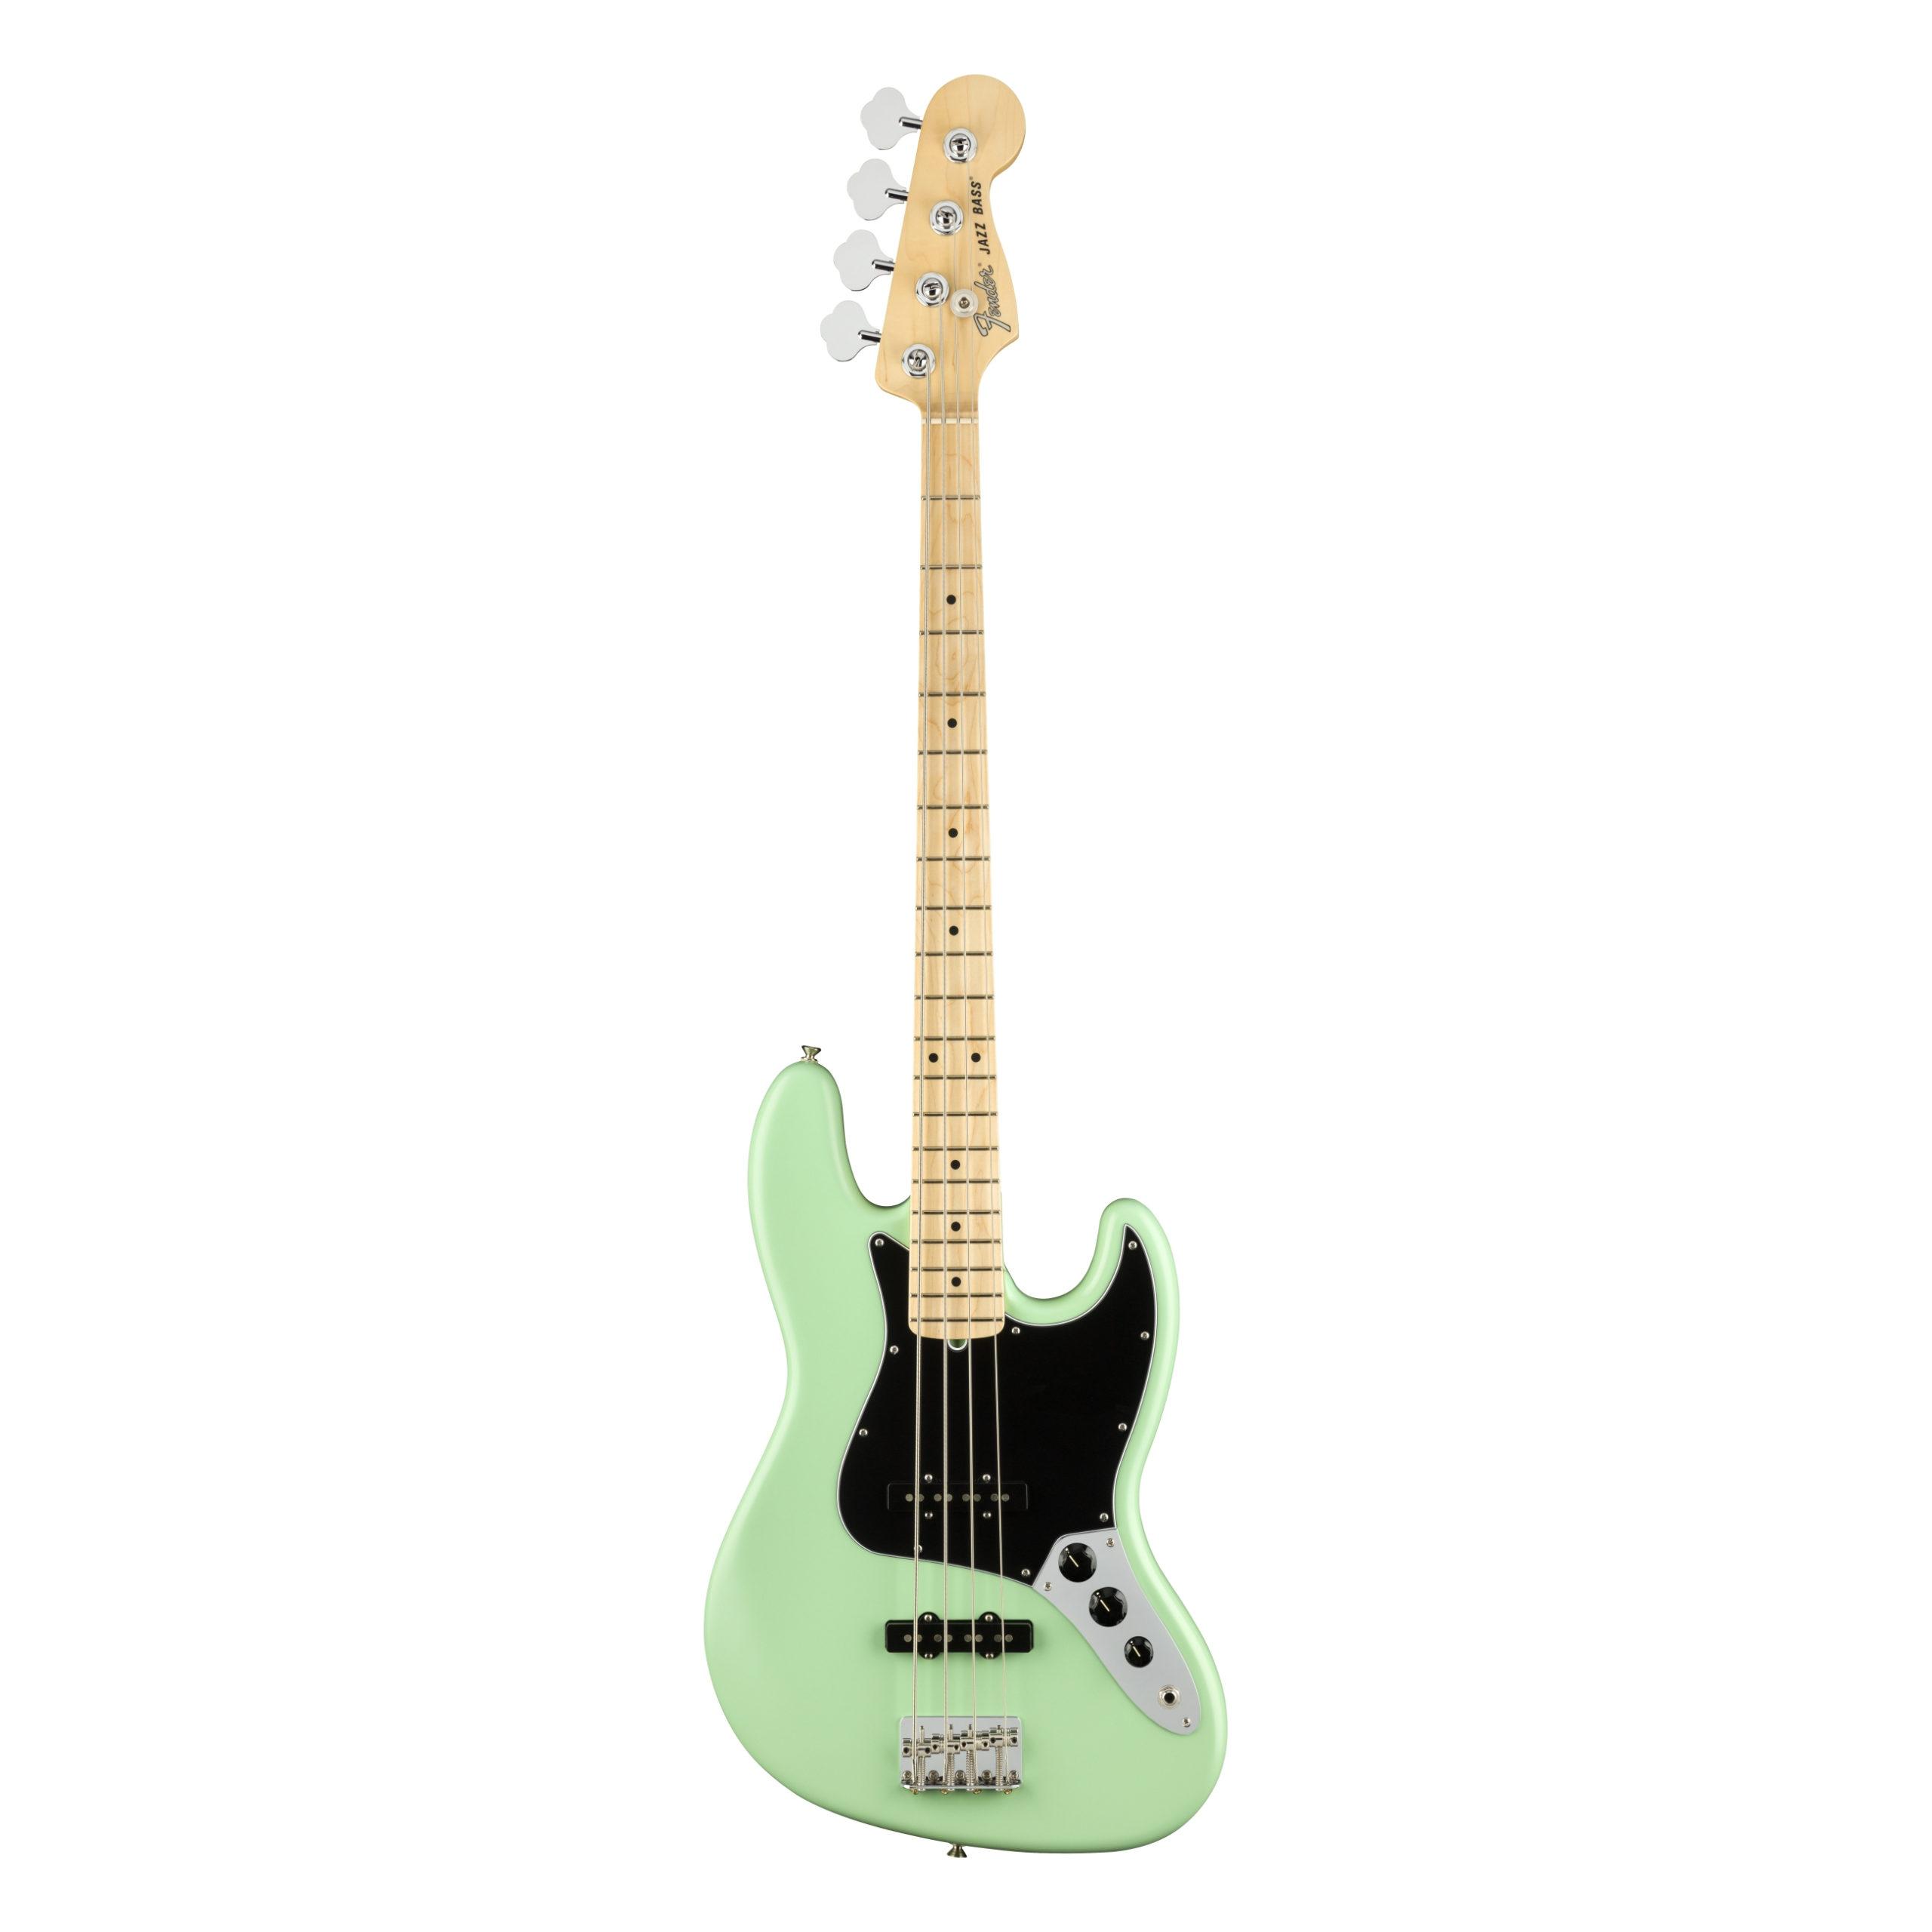 Fender American Performer Jazz Bass®, Maple Fingerboard, Satin Surf Green